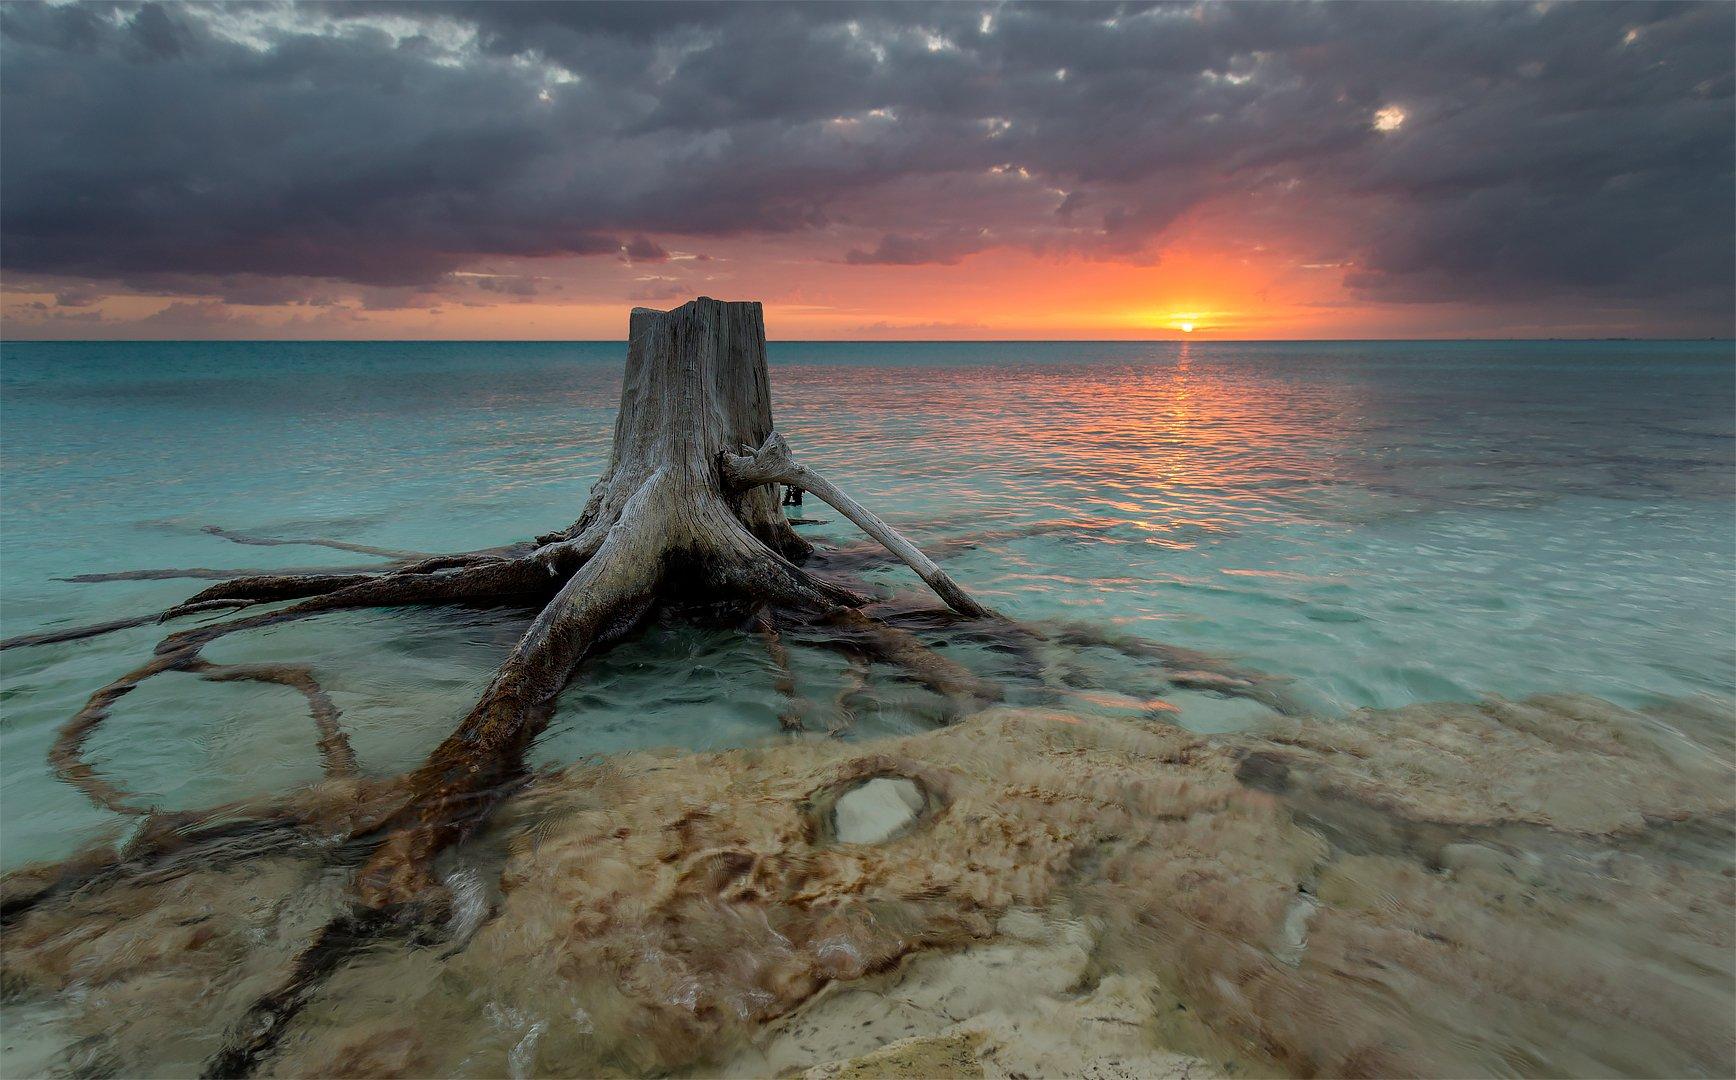 ocean, clouds, sunset, rocks, stump, root, океан, облака, закат, камни, пень, корень, G A S